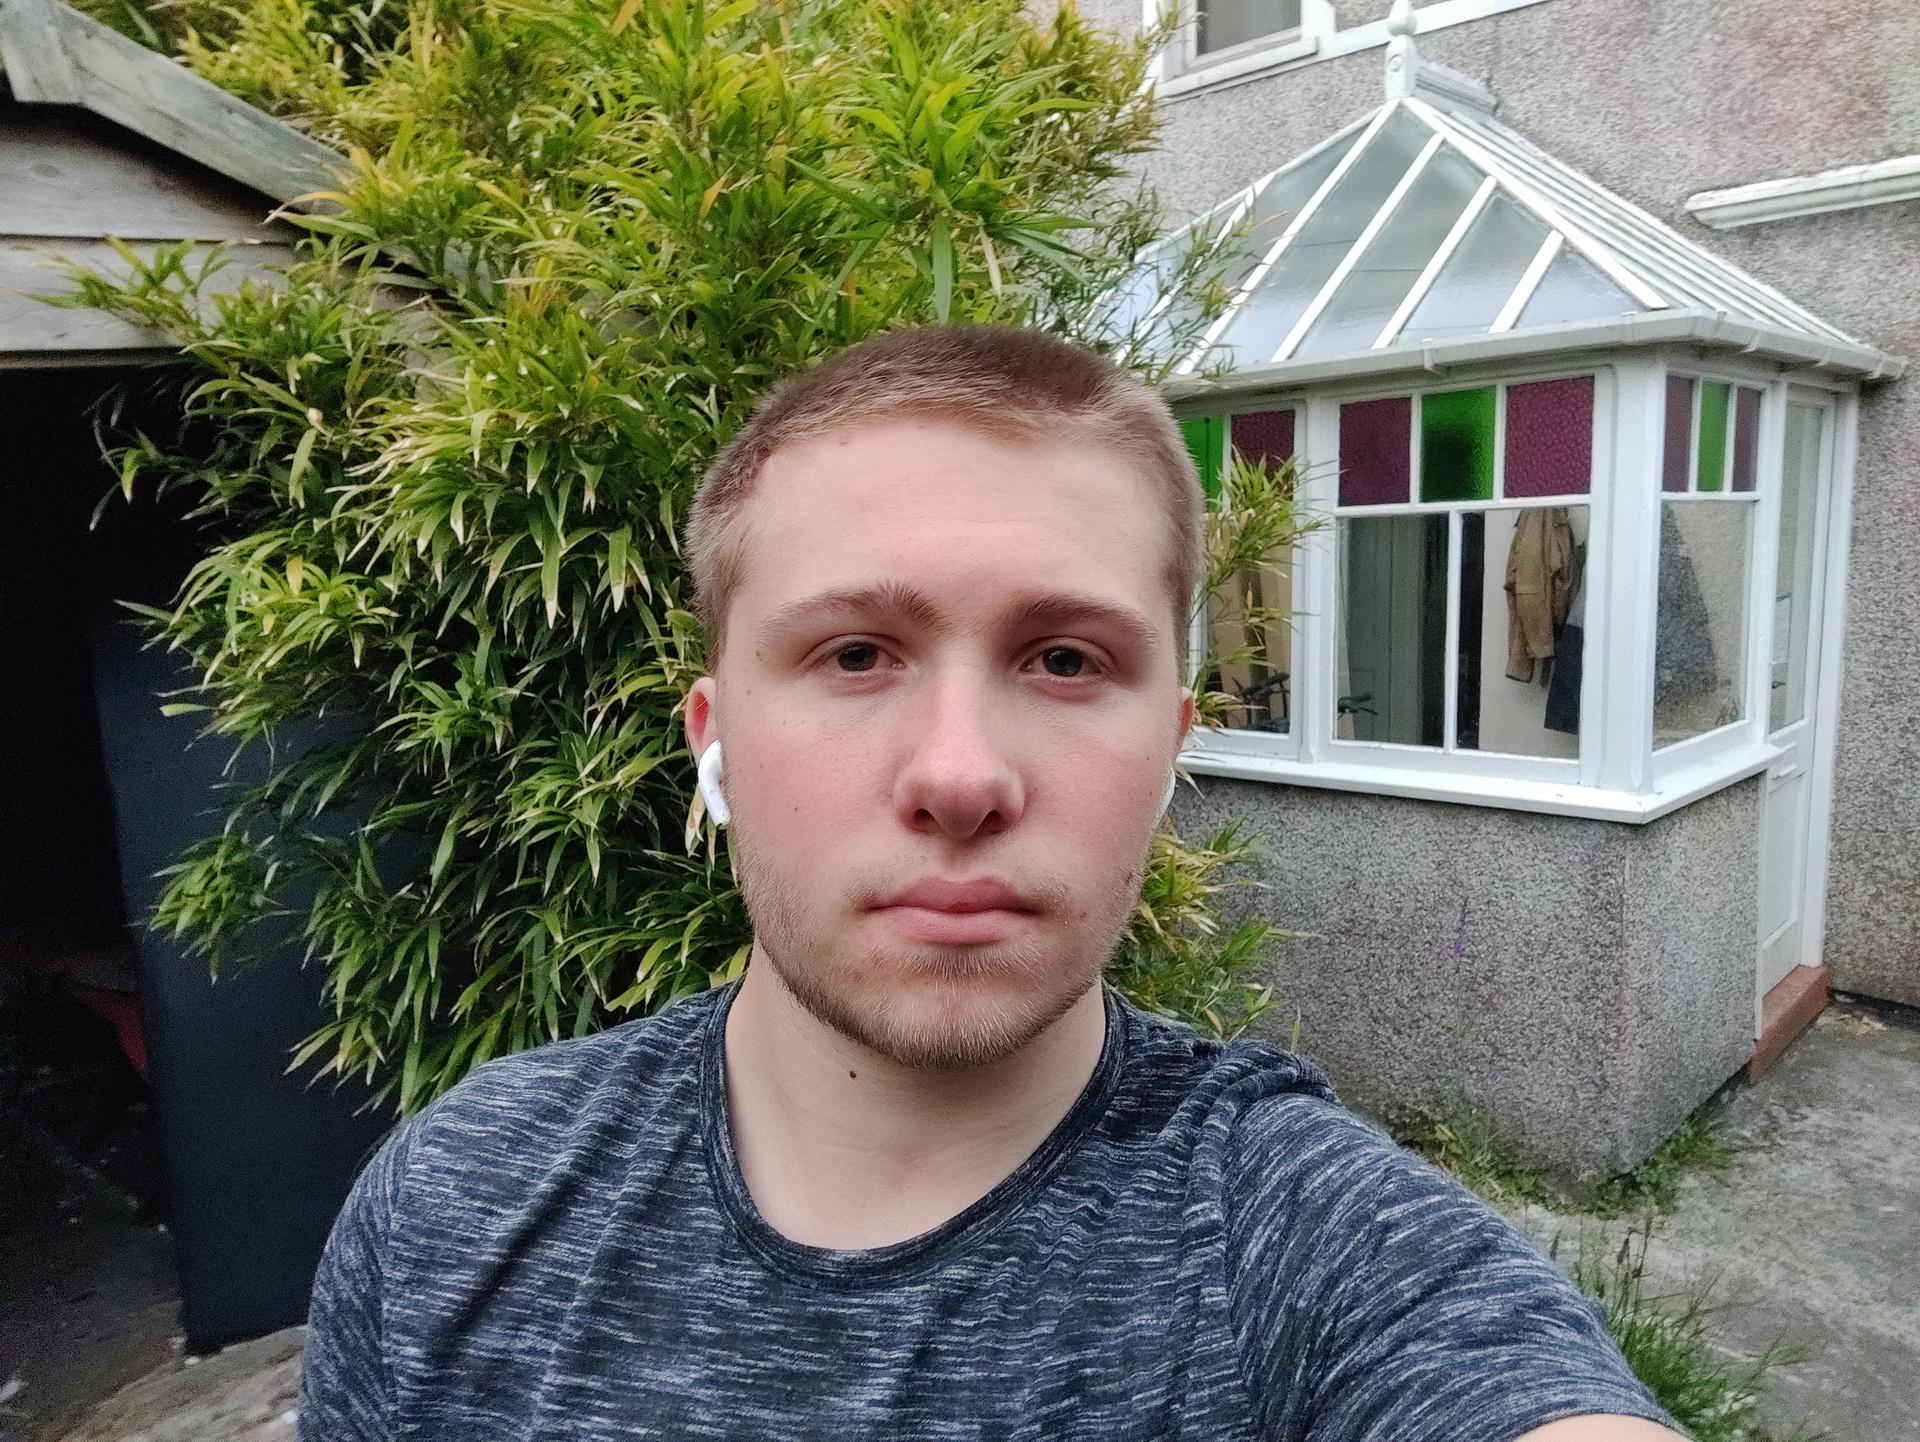 OnePlus Nord portrait mode selfie in garden